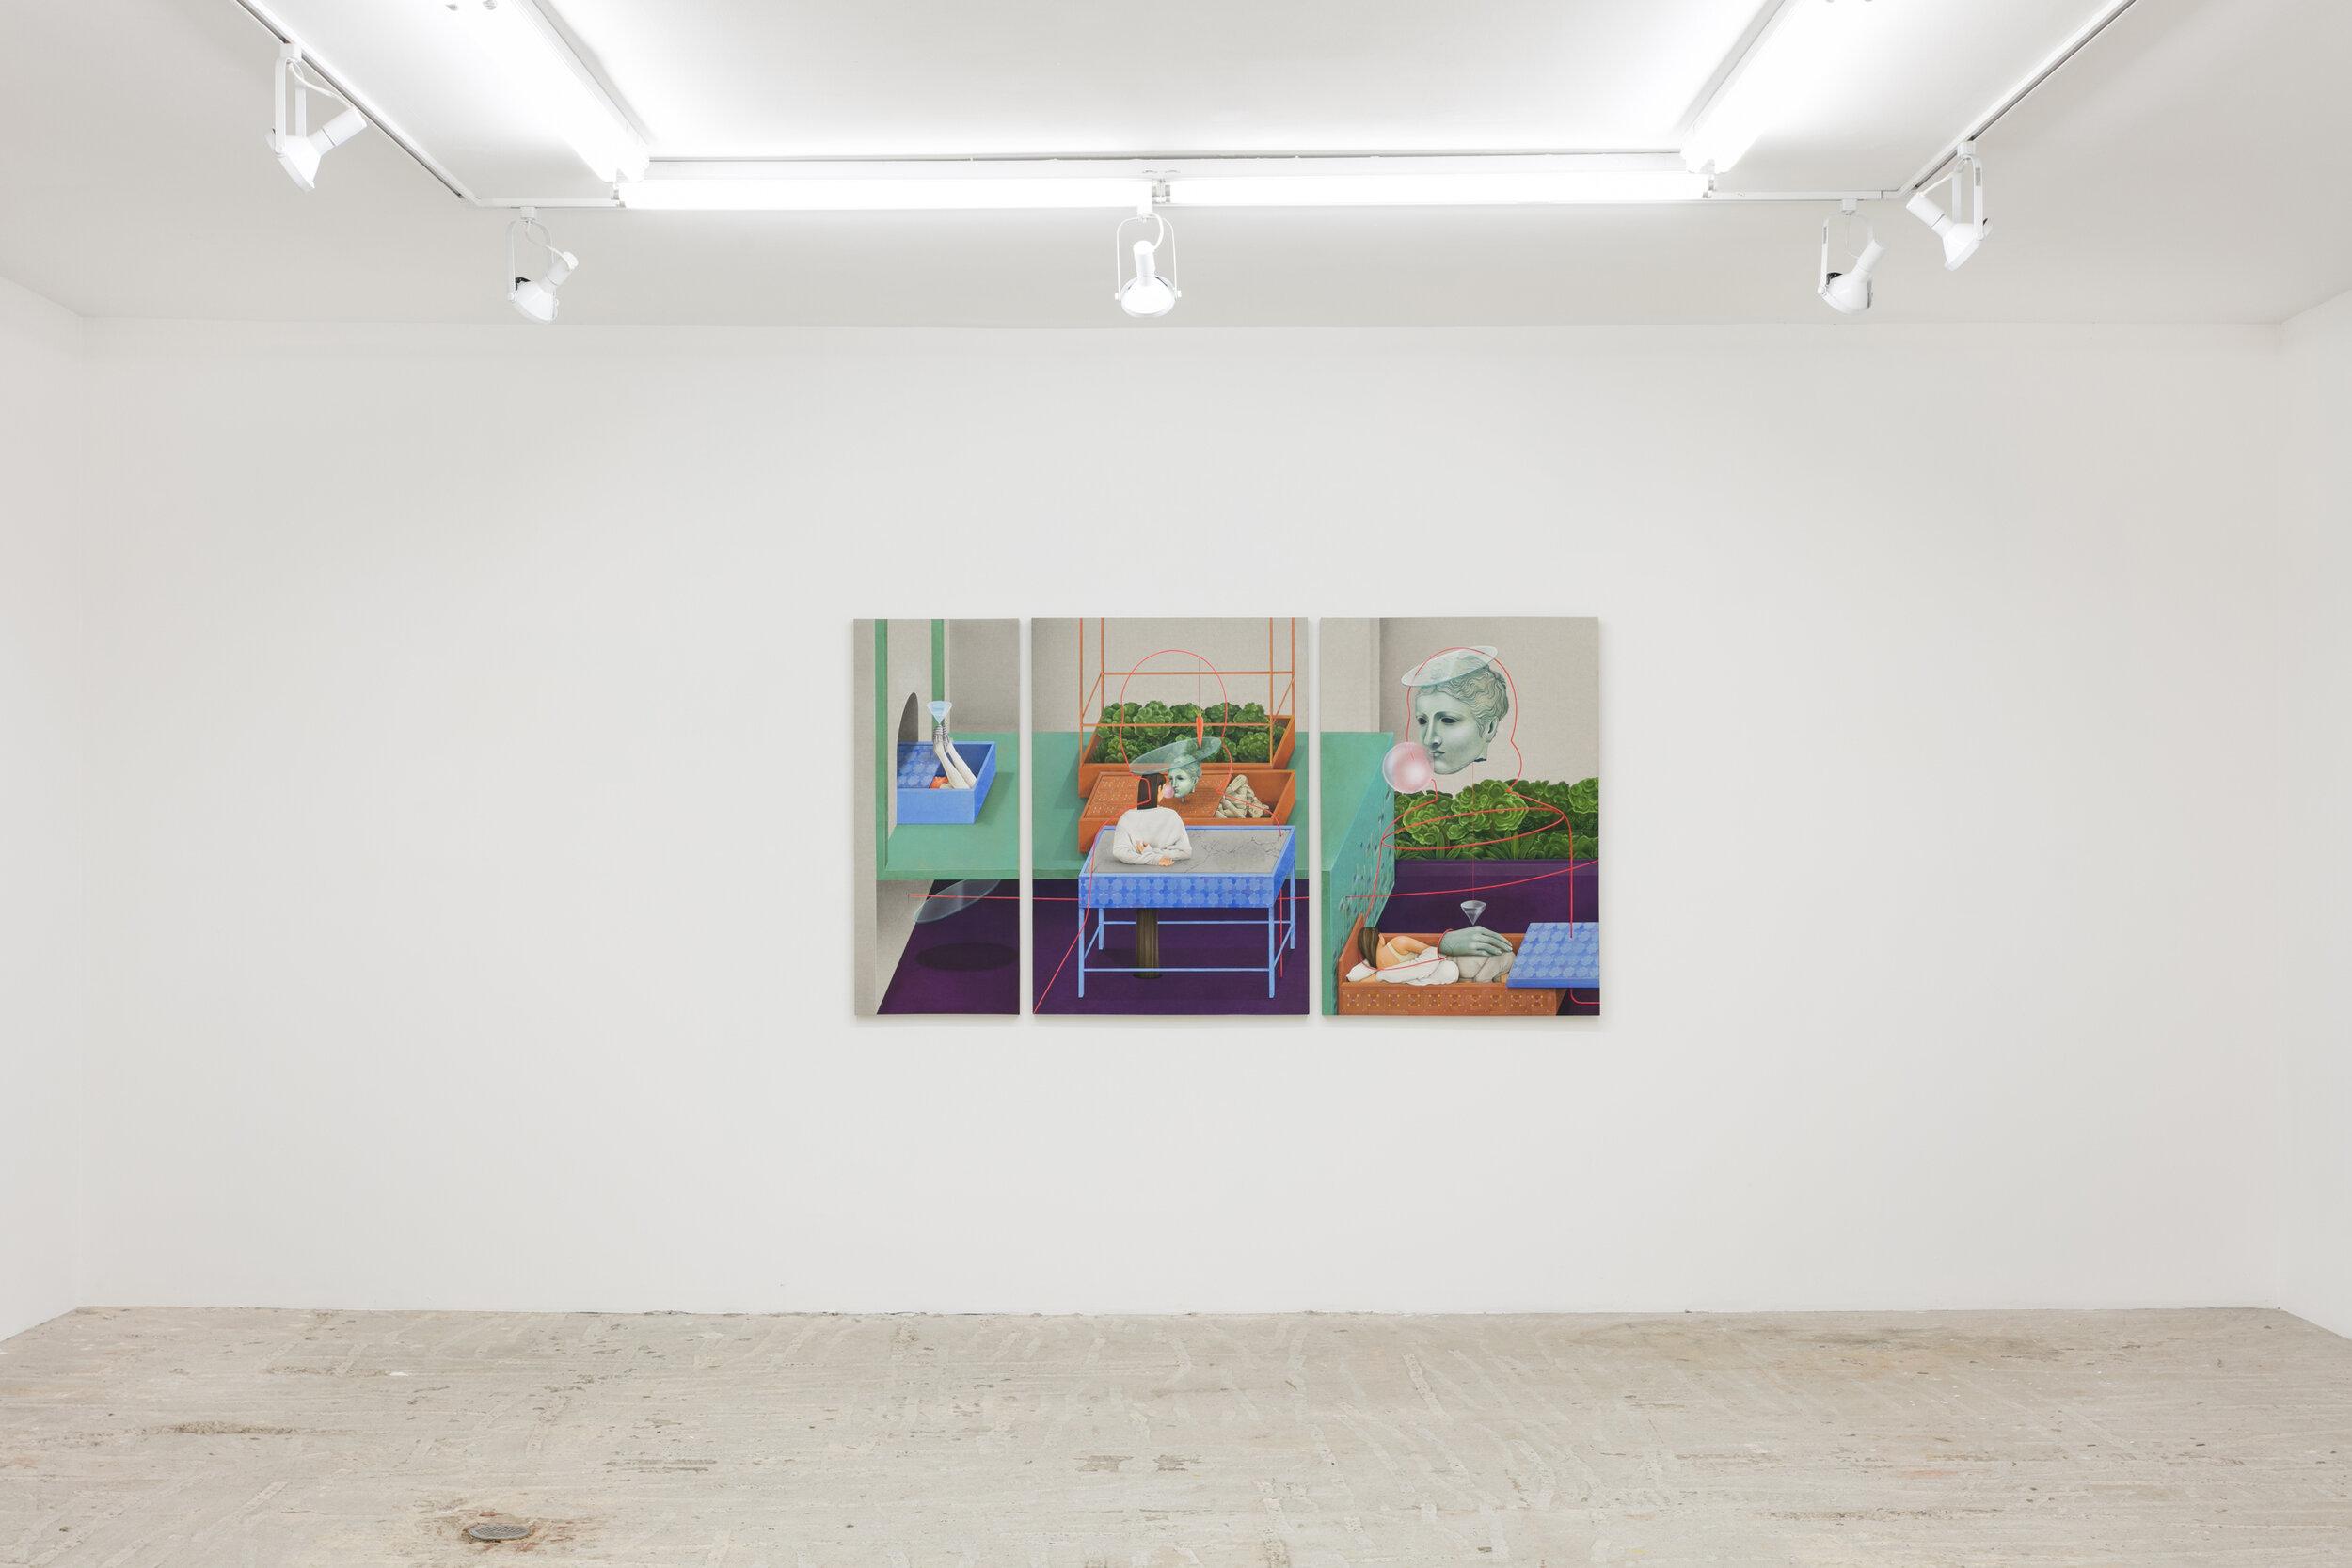 Arghavan Khosravi    Suspended Life , 2019  Installation view